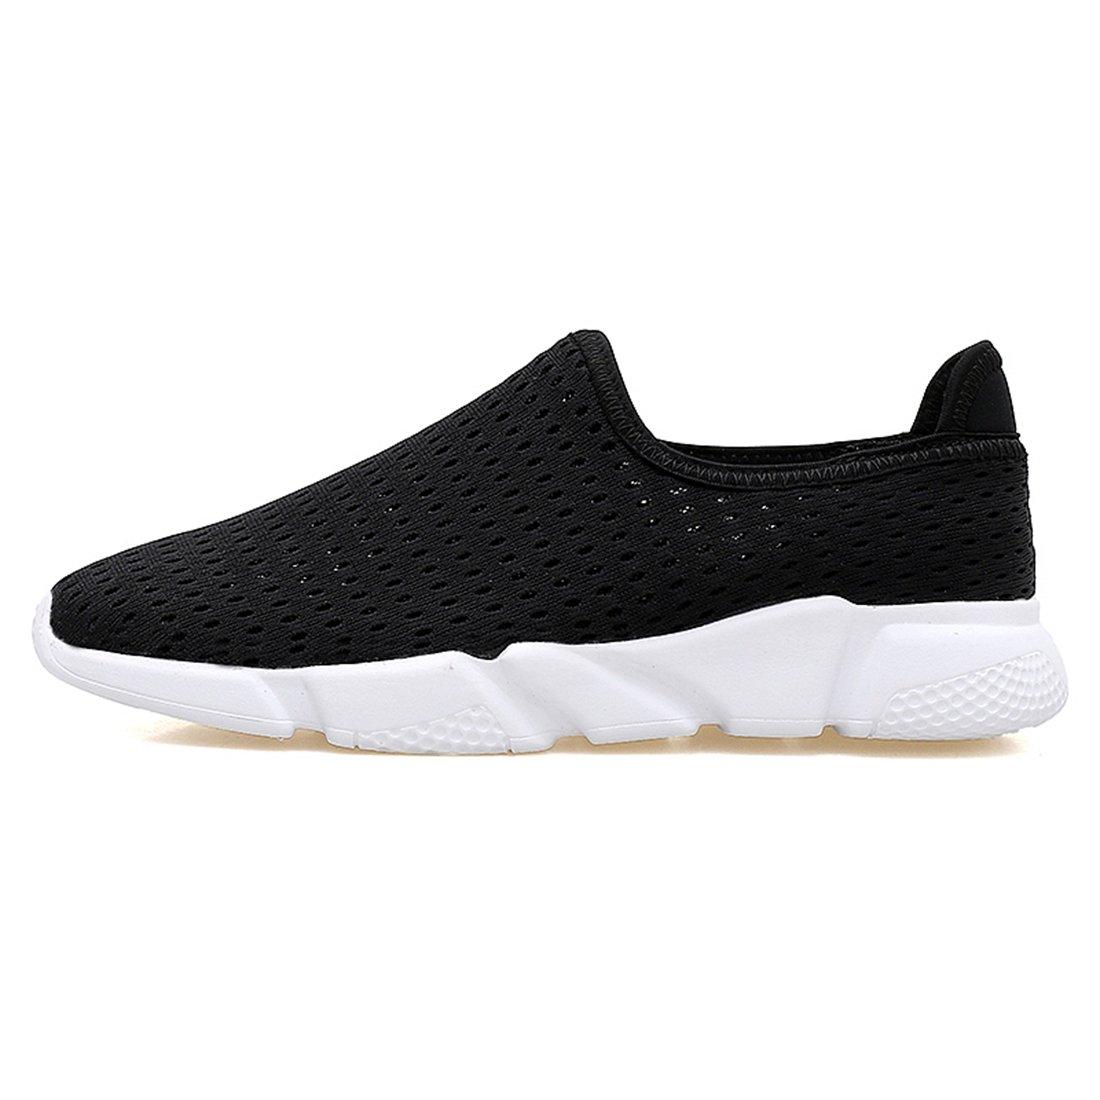 Men Women Ultra Light Weight Water Aqua Shoes Quick Drying Slip On Mesh Sneakers Black 250mm:9 B(M) US Women/7 D(M) US Men